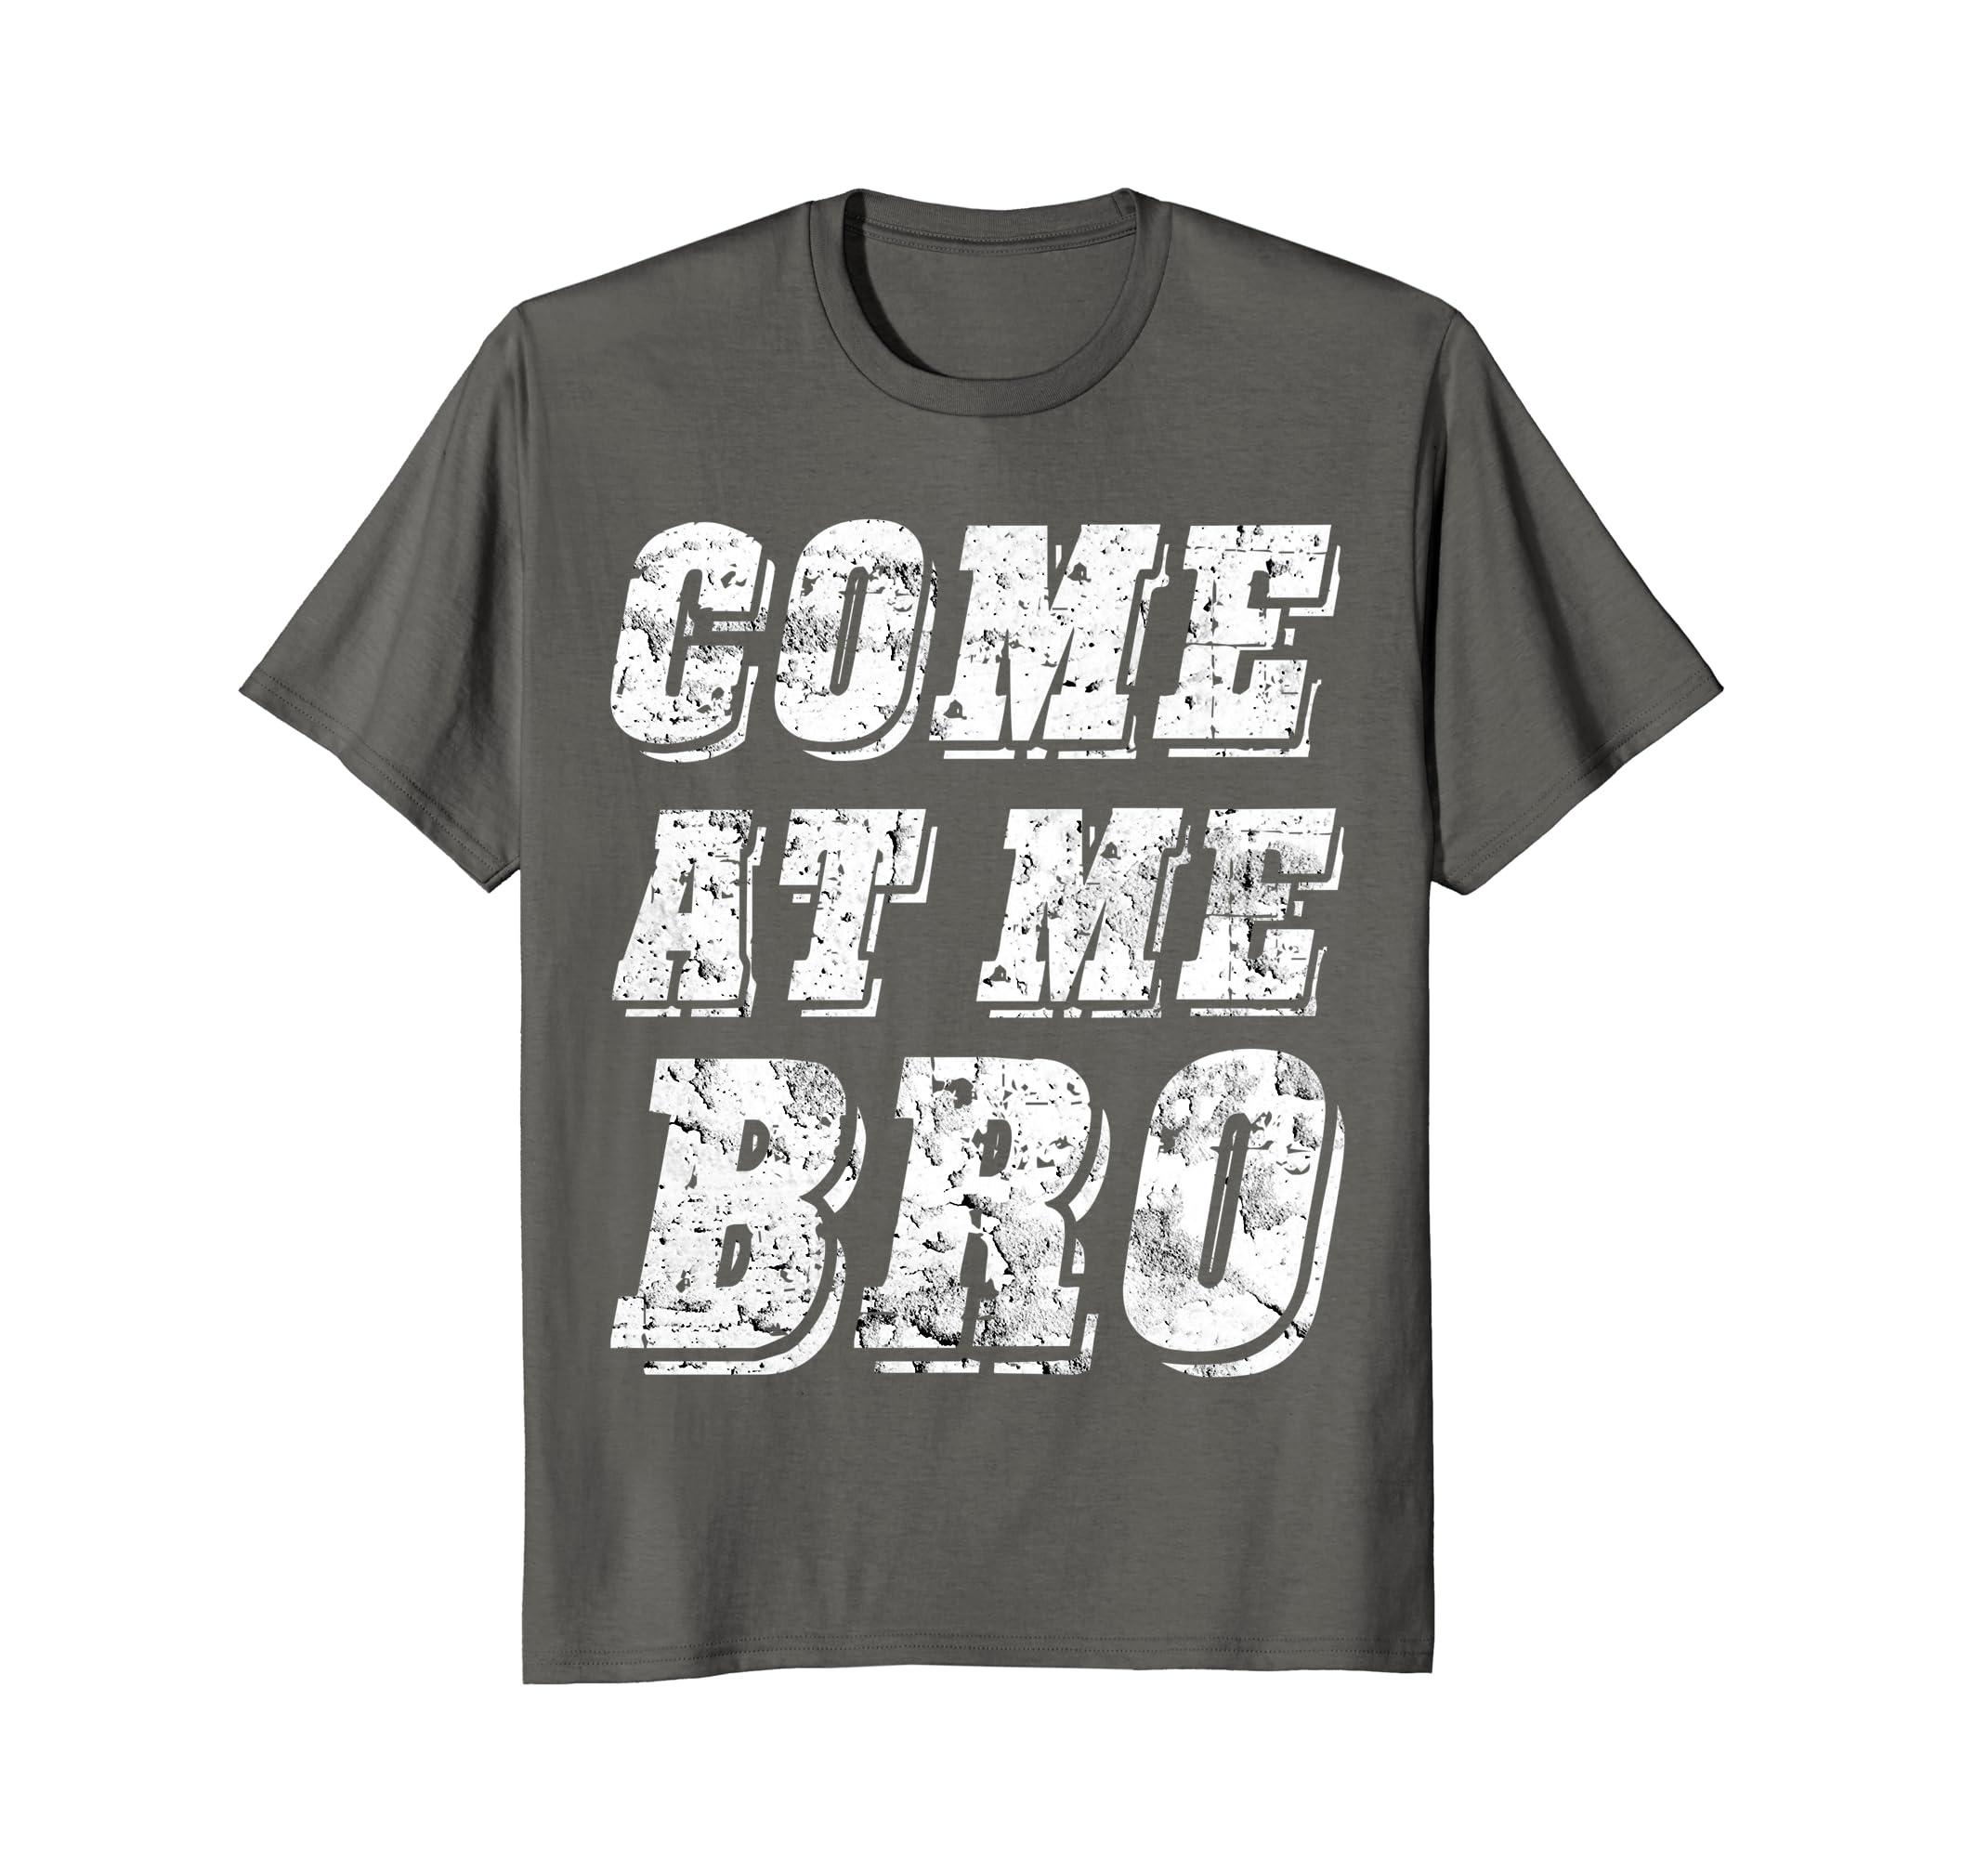 Cool Viral Videos: Come At Me Bro T-Shirt Cool Gift Idea Viral Meme Tee Shirt